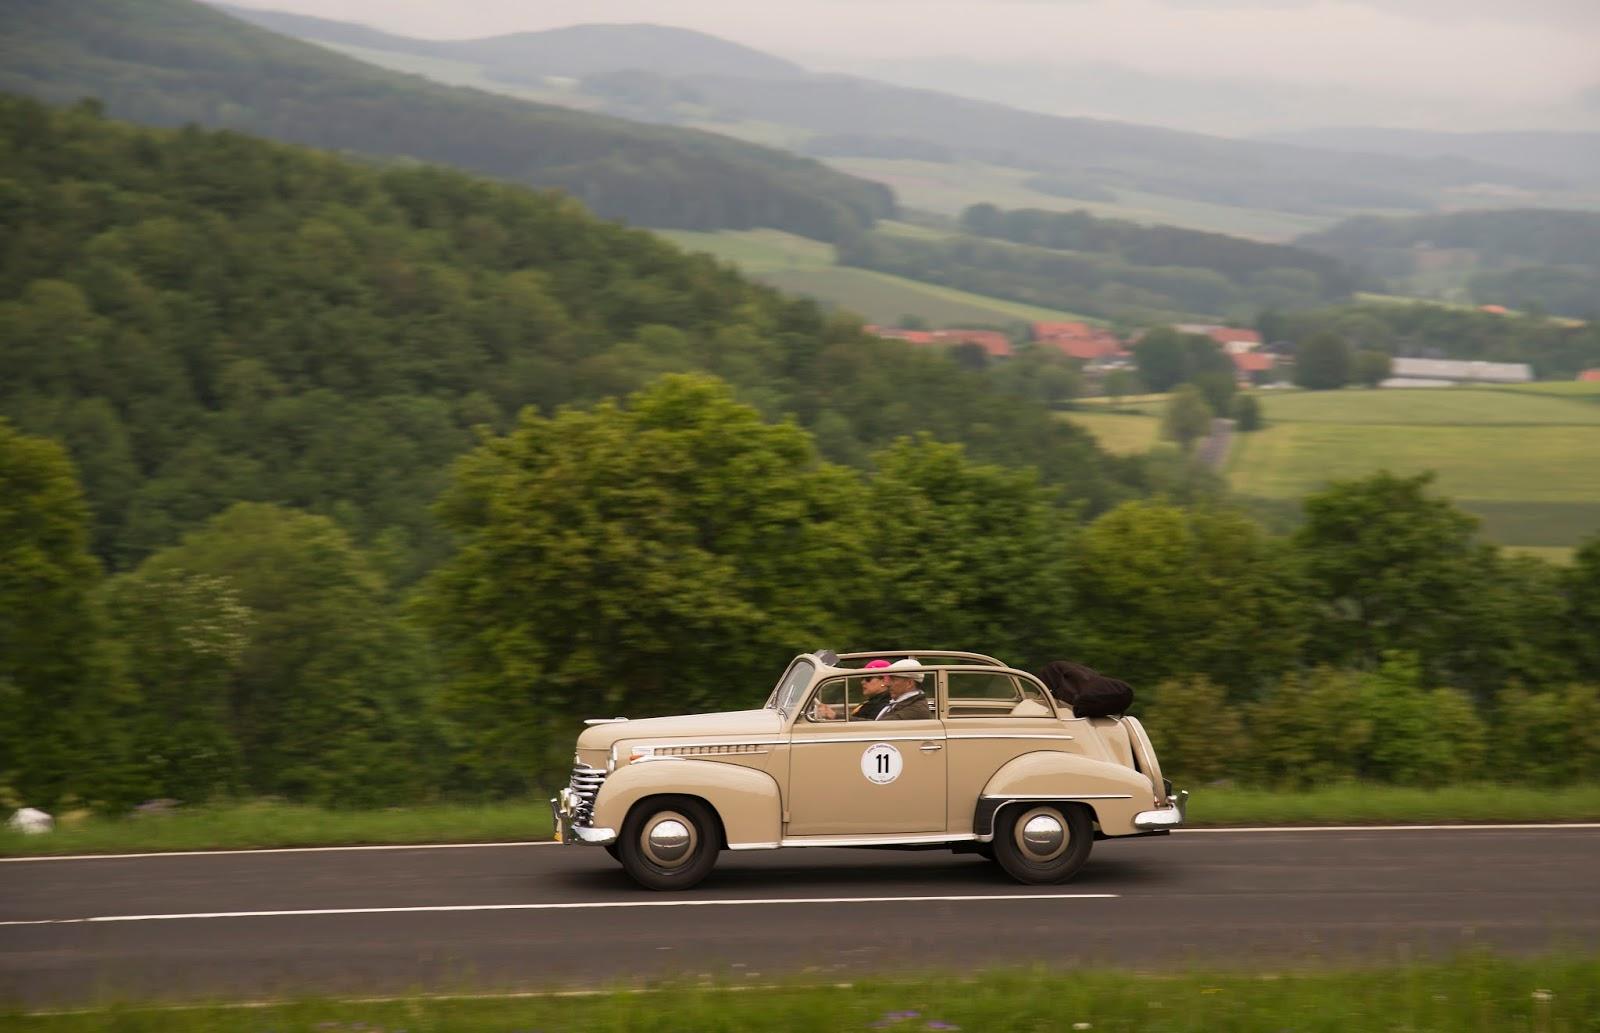 Opel Rallye Hessen Thueringen 2016 Olympia Cabrio Limousine 301185 Ταξίδι στο χρόνο μέσα από την ιστορία 100 χρόνων των Opel Cabrio cabrio, Opel, Opel 8/25 hp, Opel Cascada, Opel Olympia, Opel Record